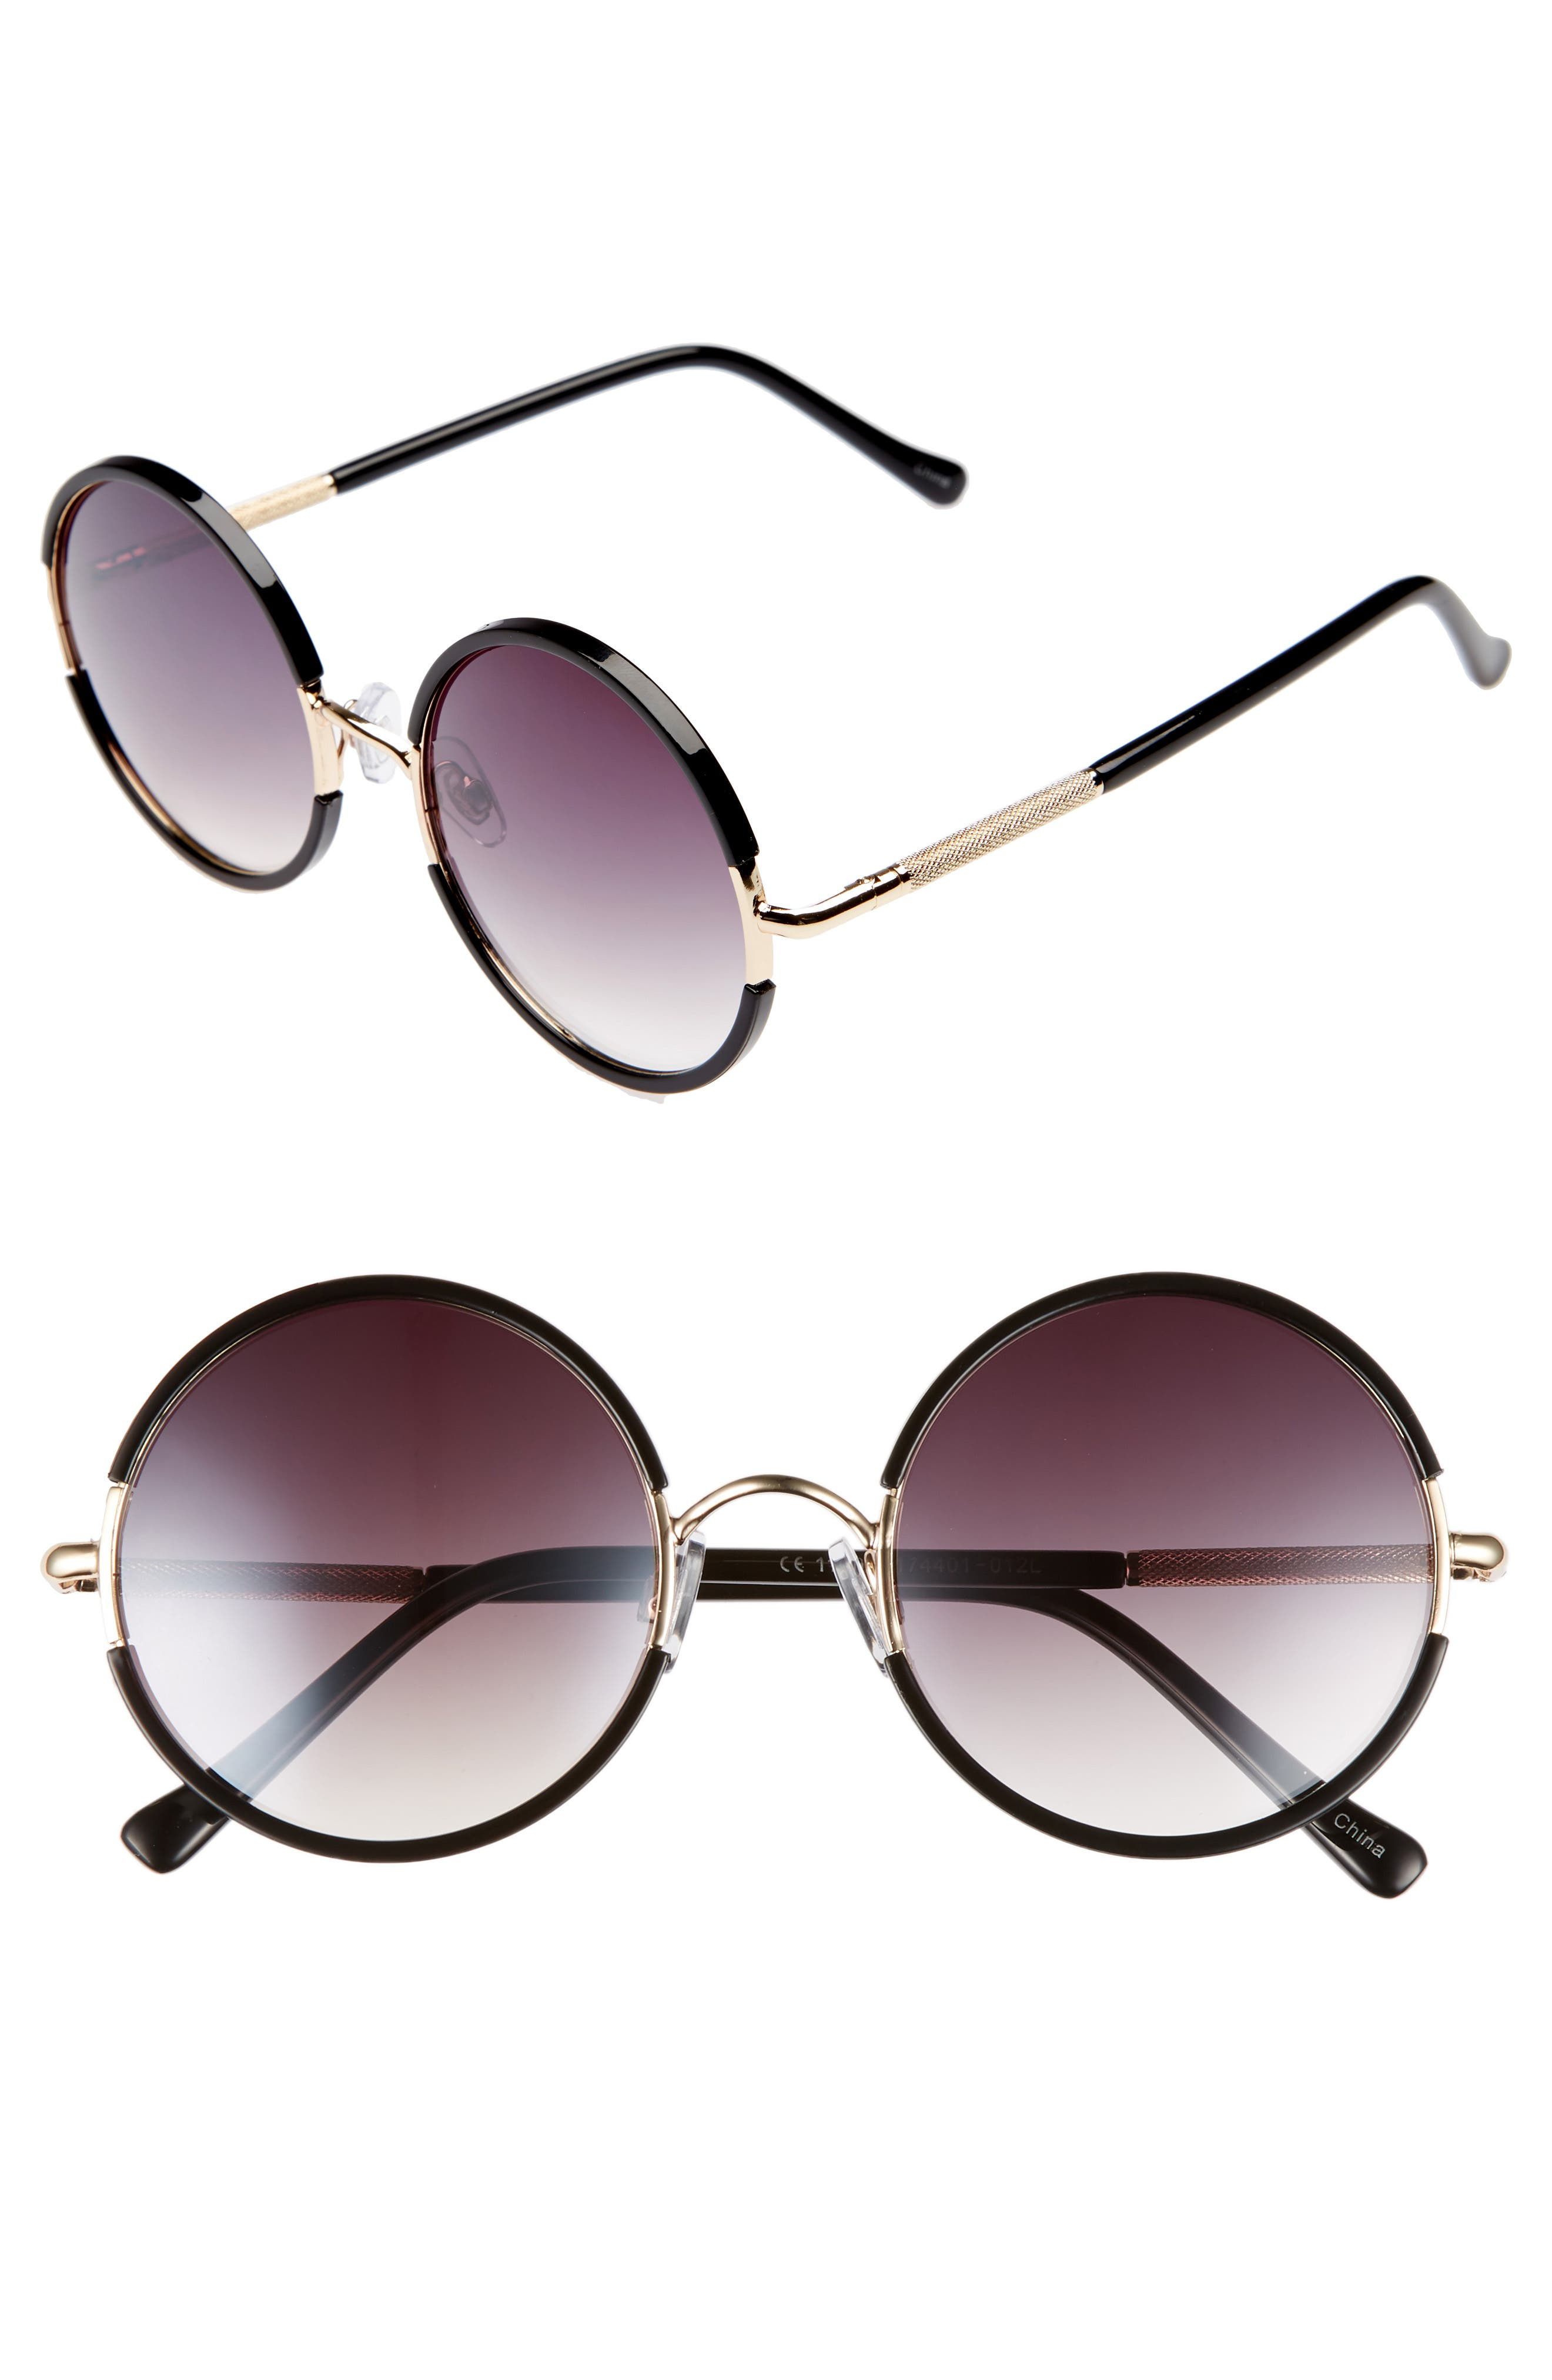 52mm Gradient Round Sunglasses,                         Main,                         color, Black/ Gold